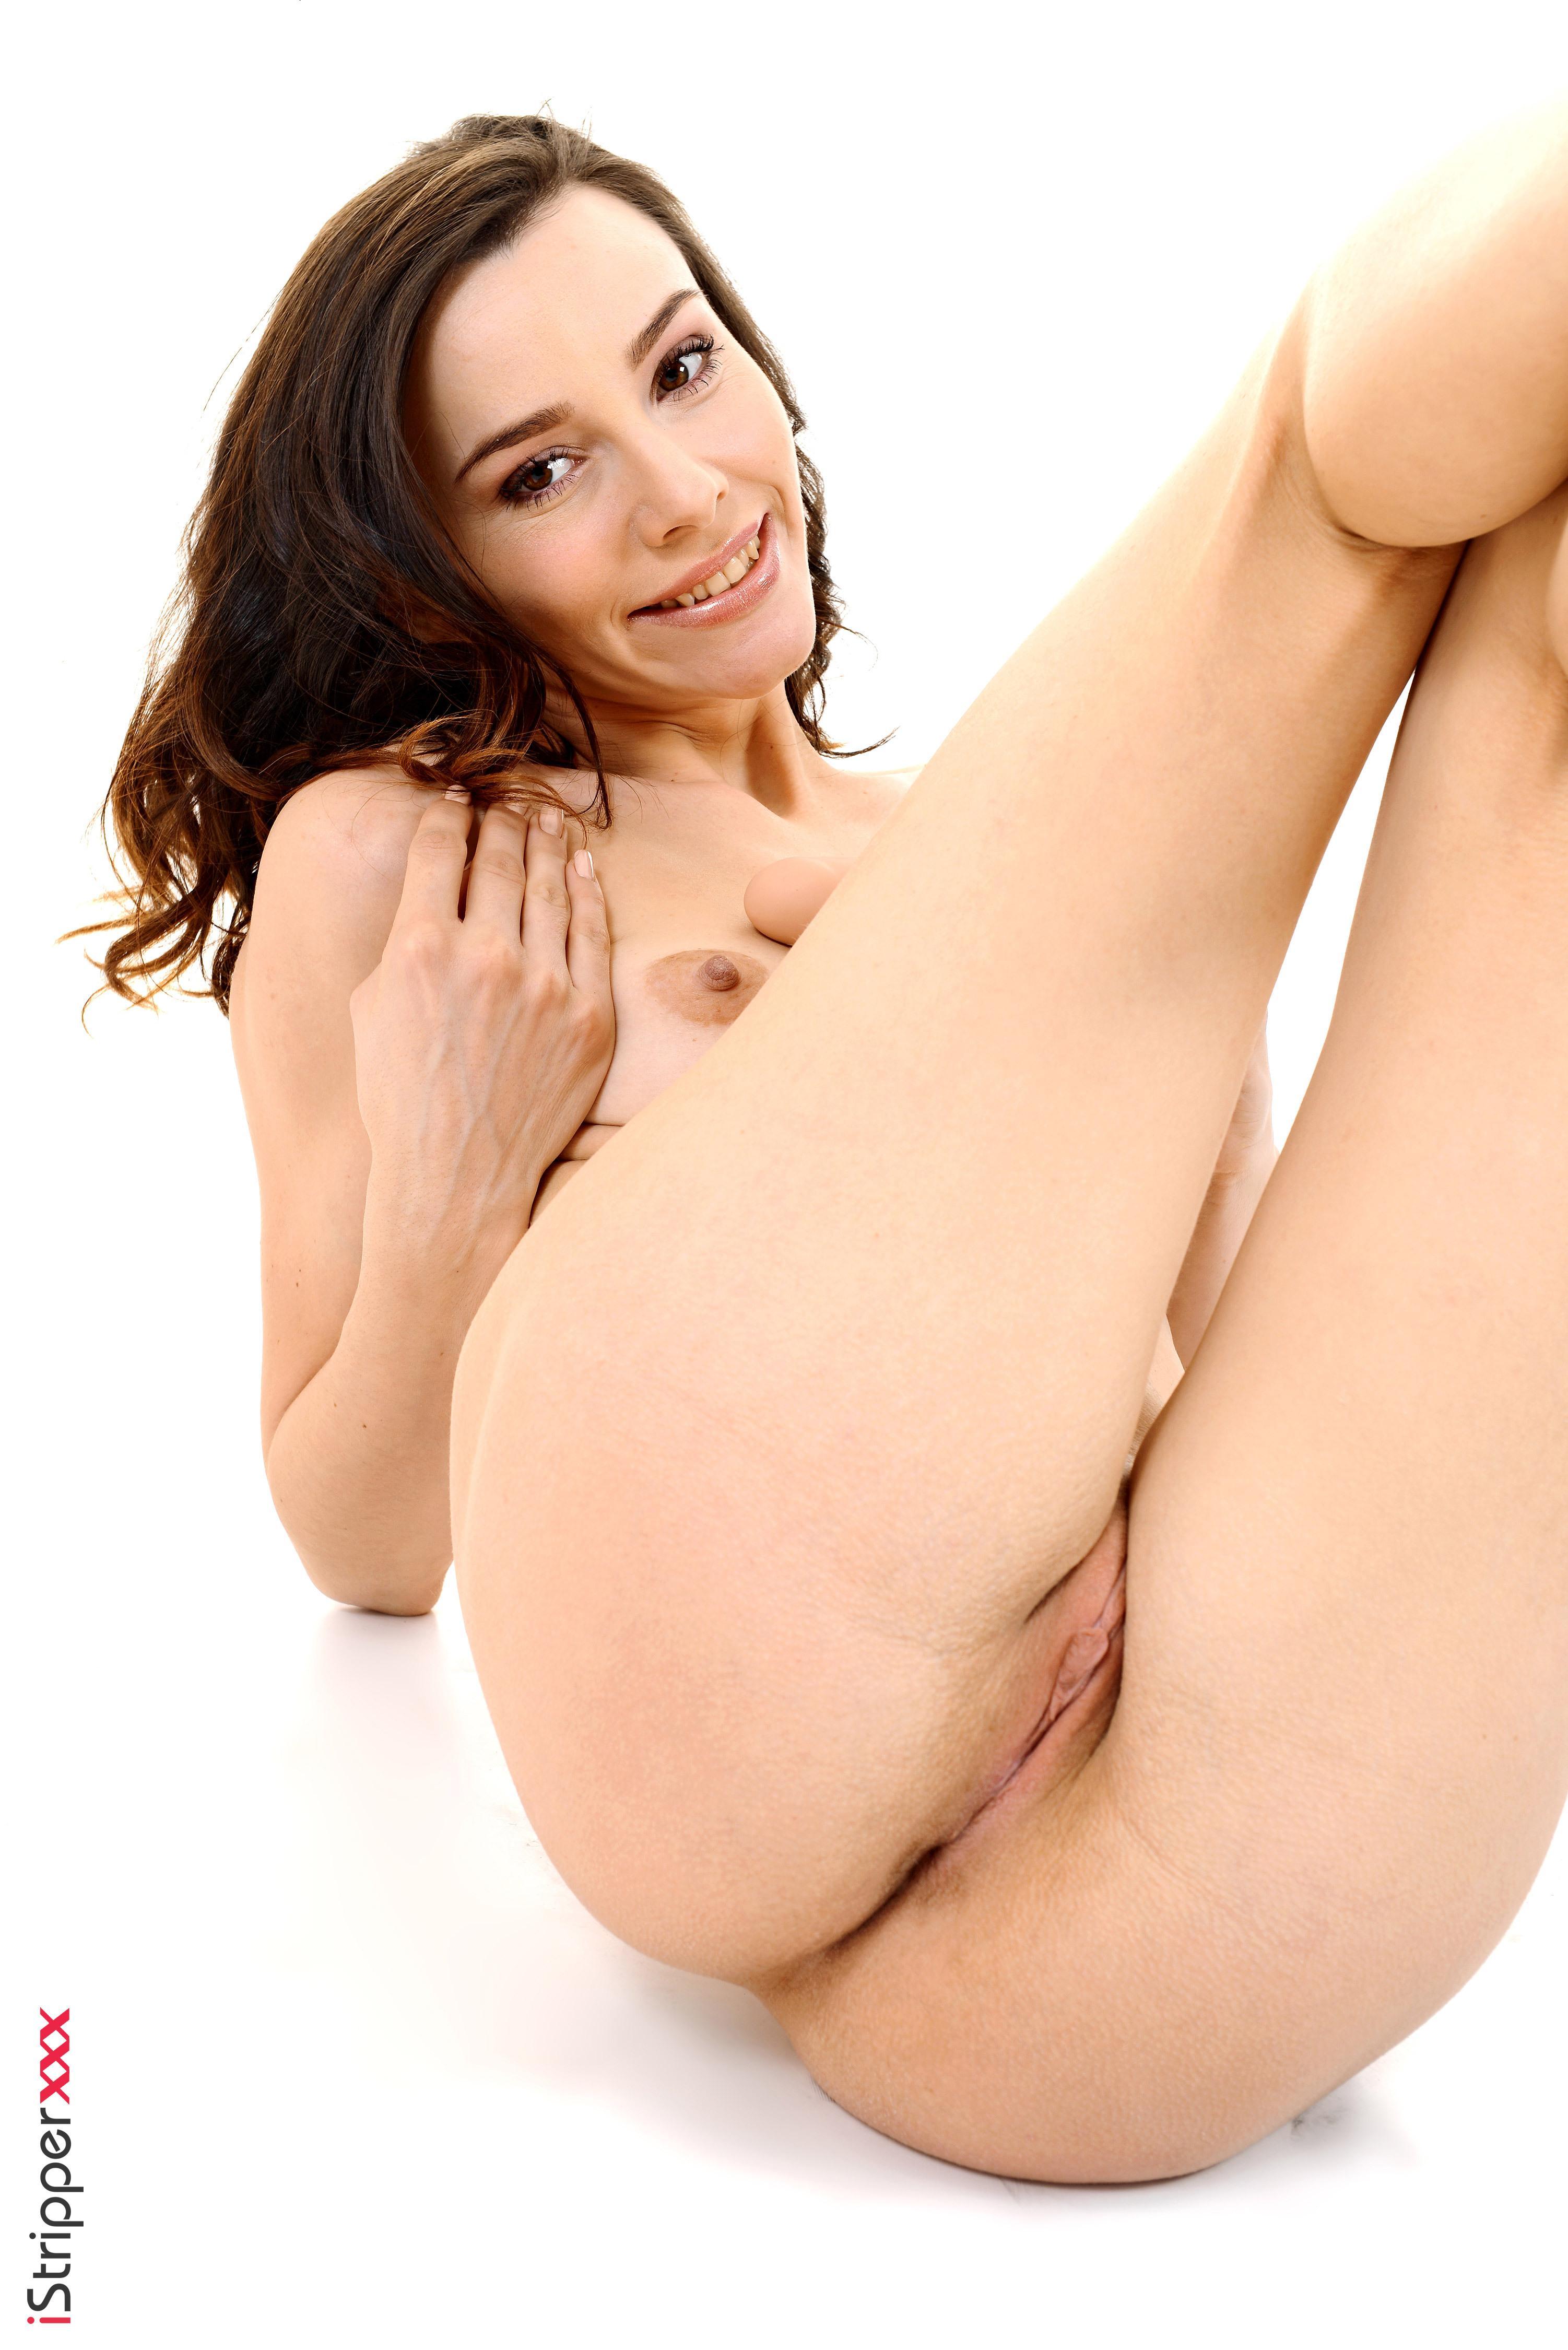 Solo girl naked